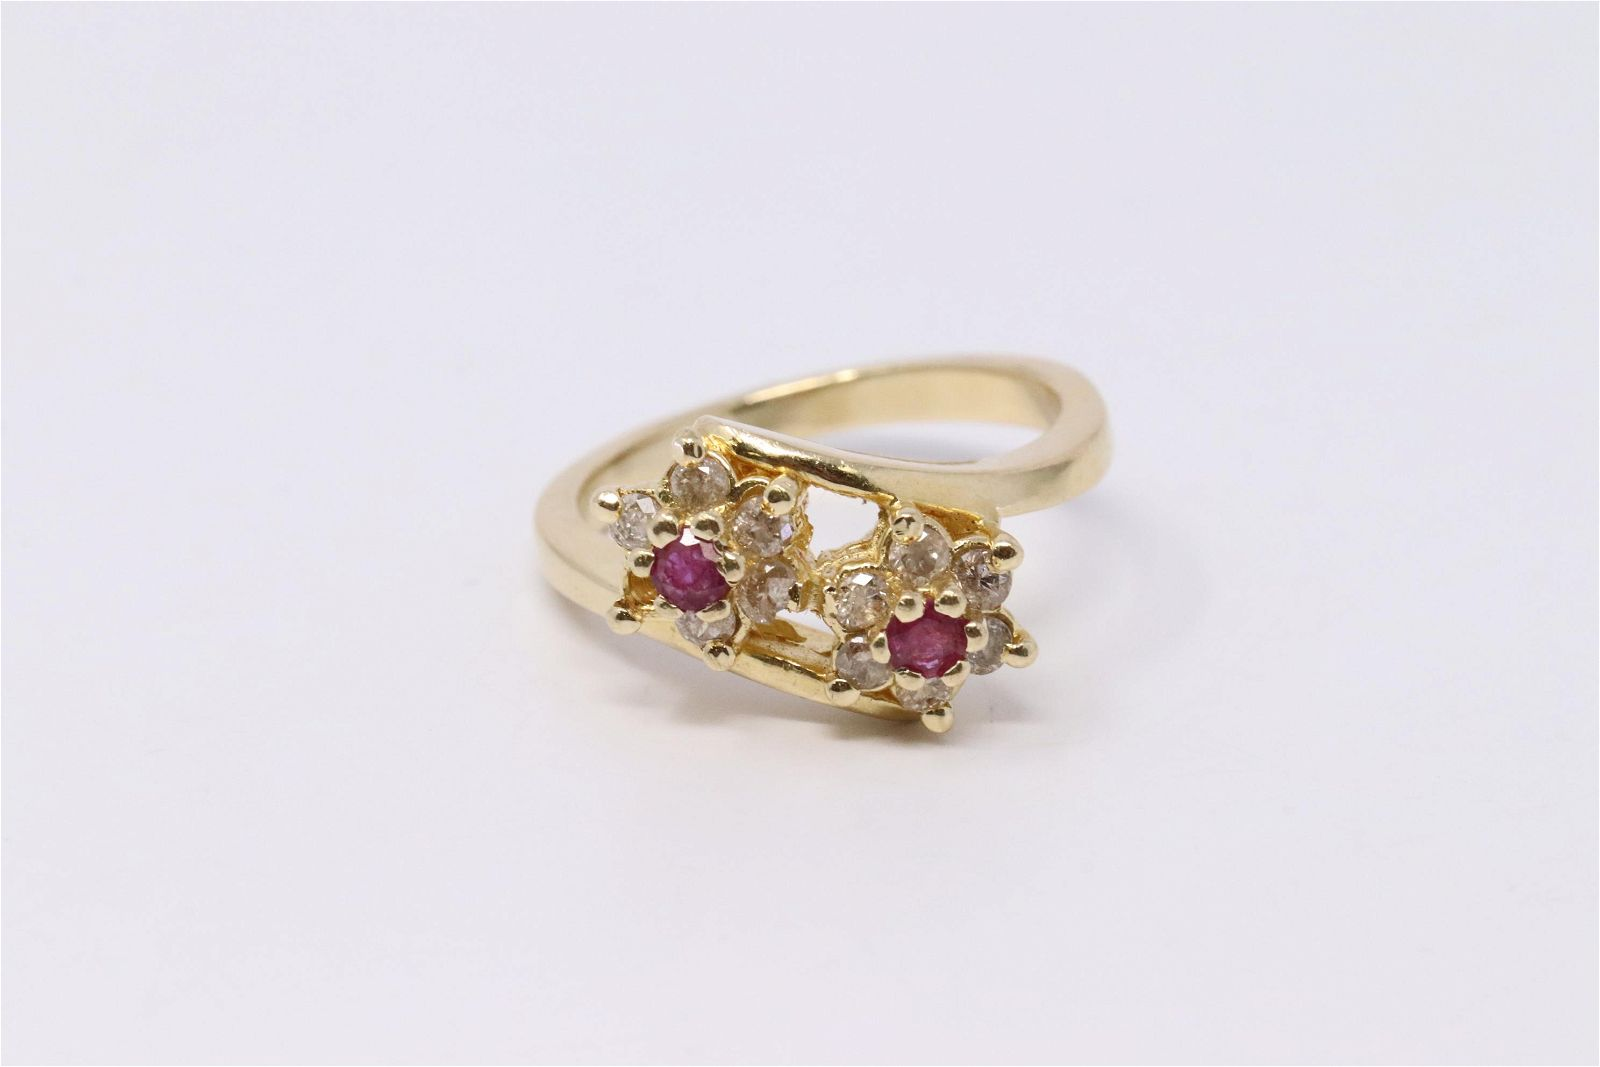 Vintage 14K Diamond & Ruby Ring